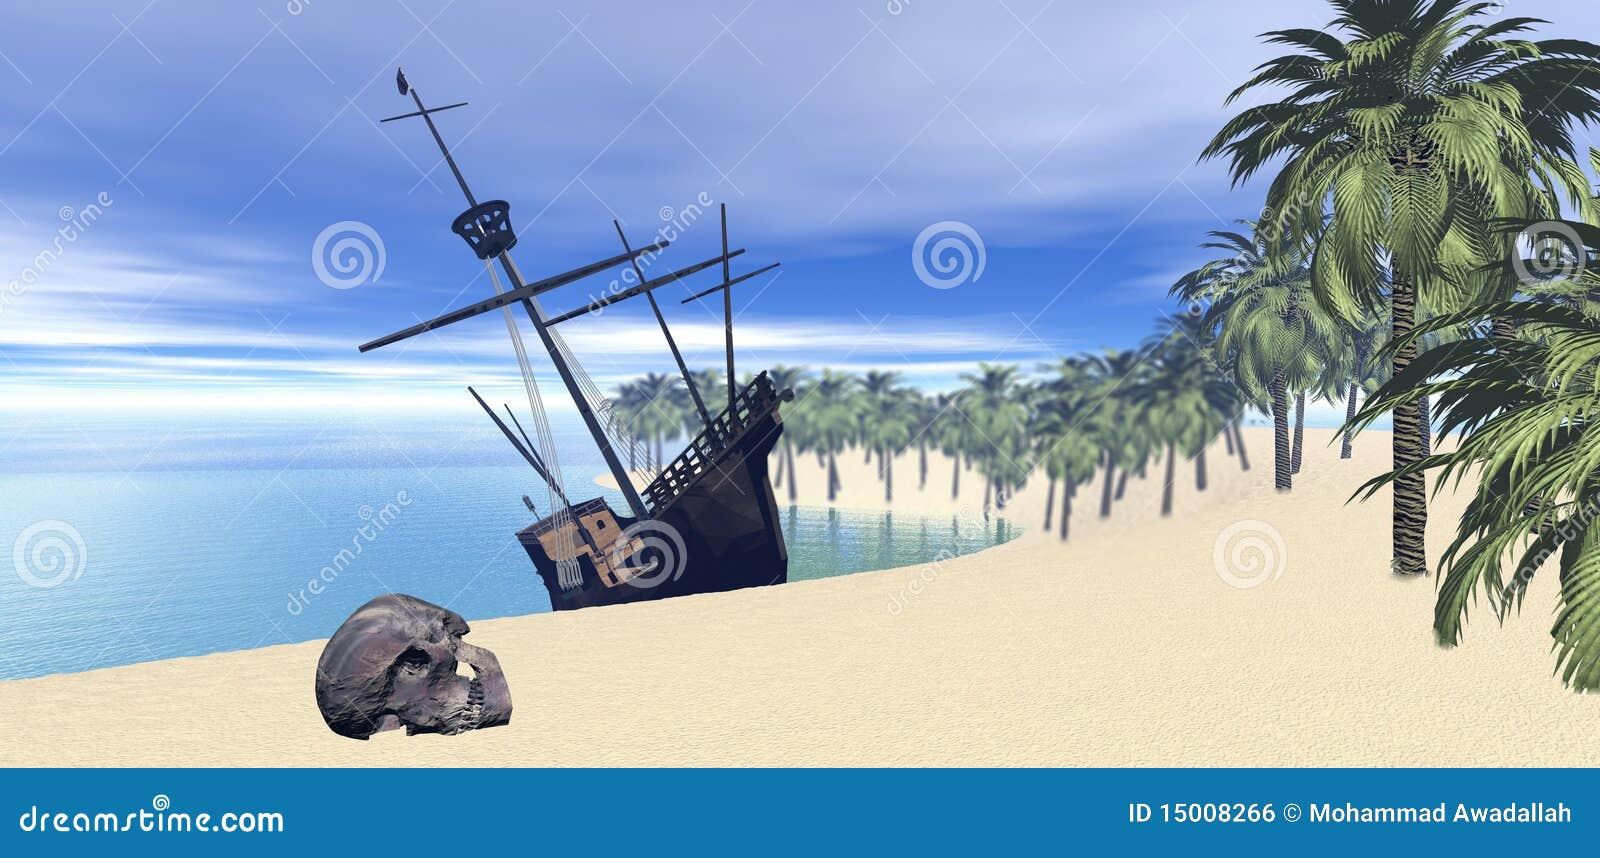 Sailing Ship On Desert Island Royalty Free Stock Image